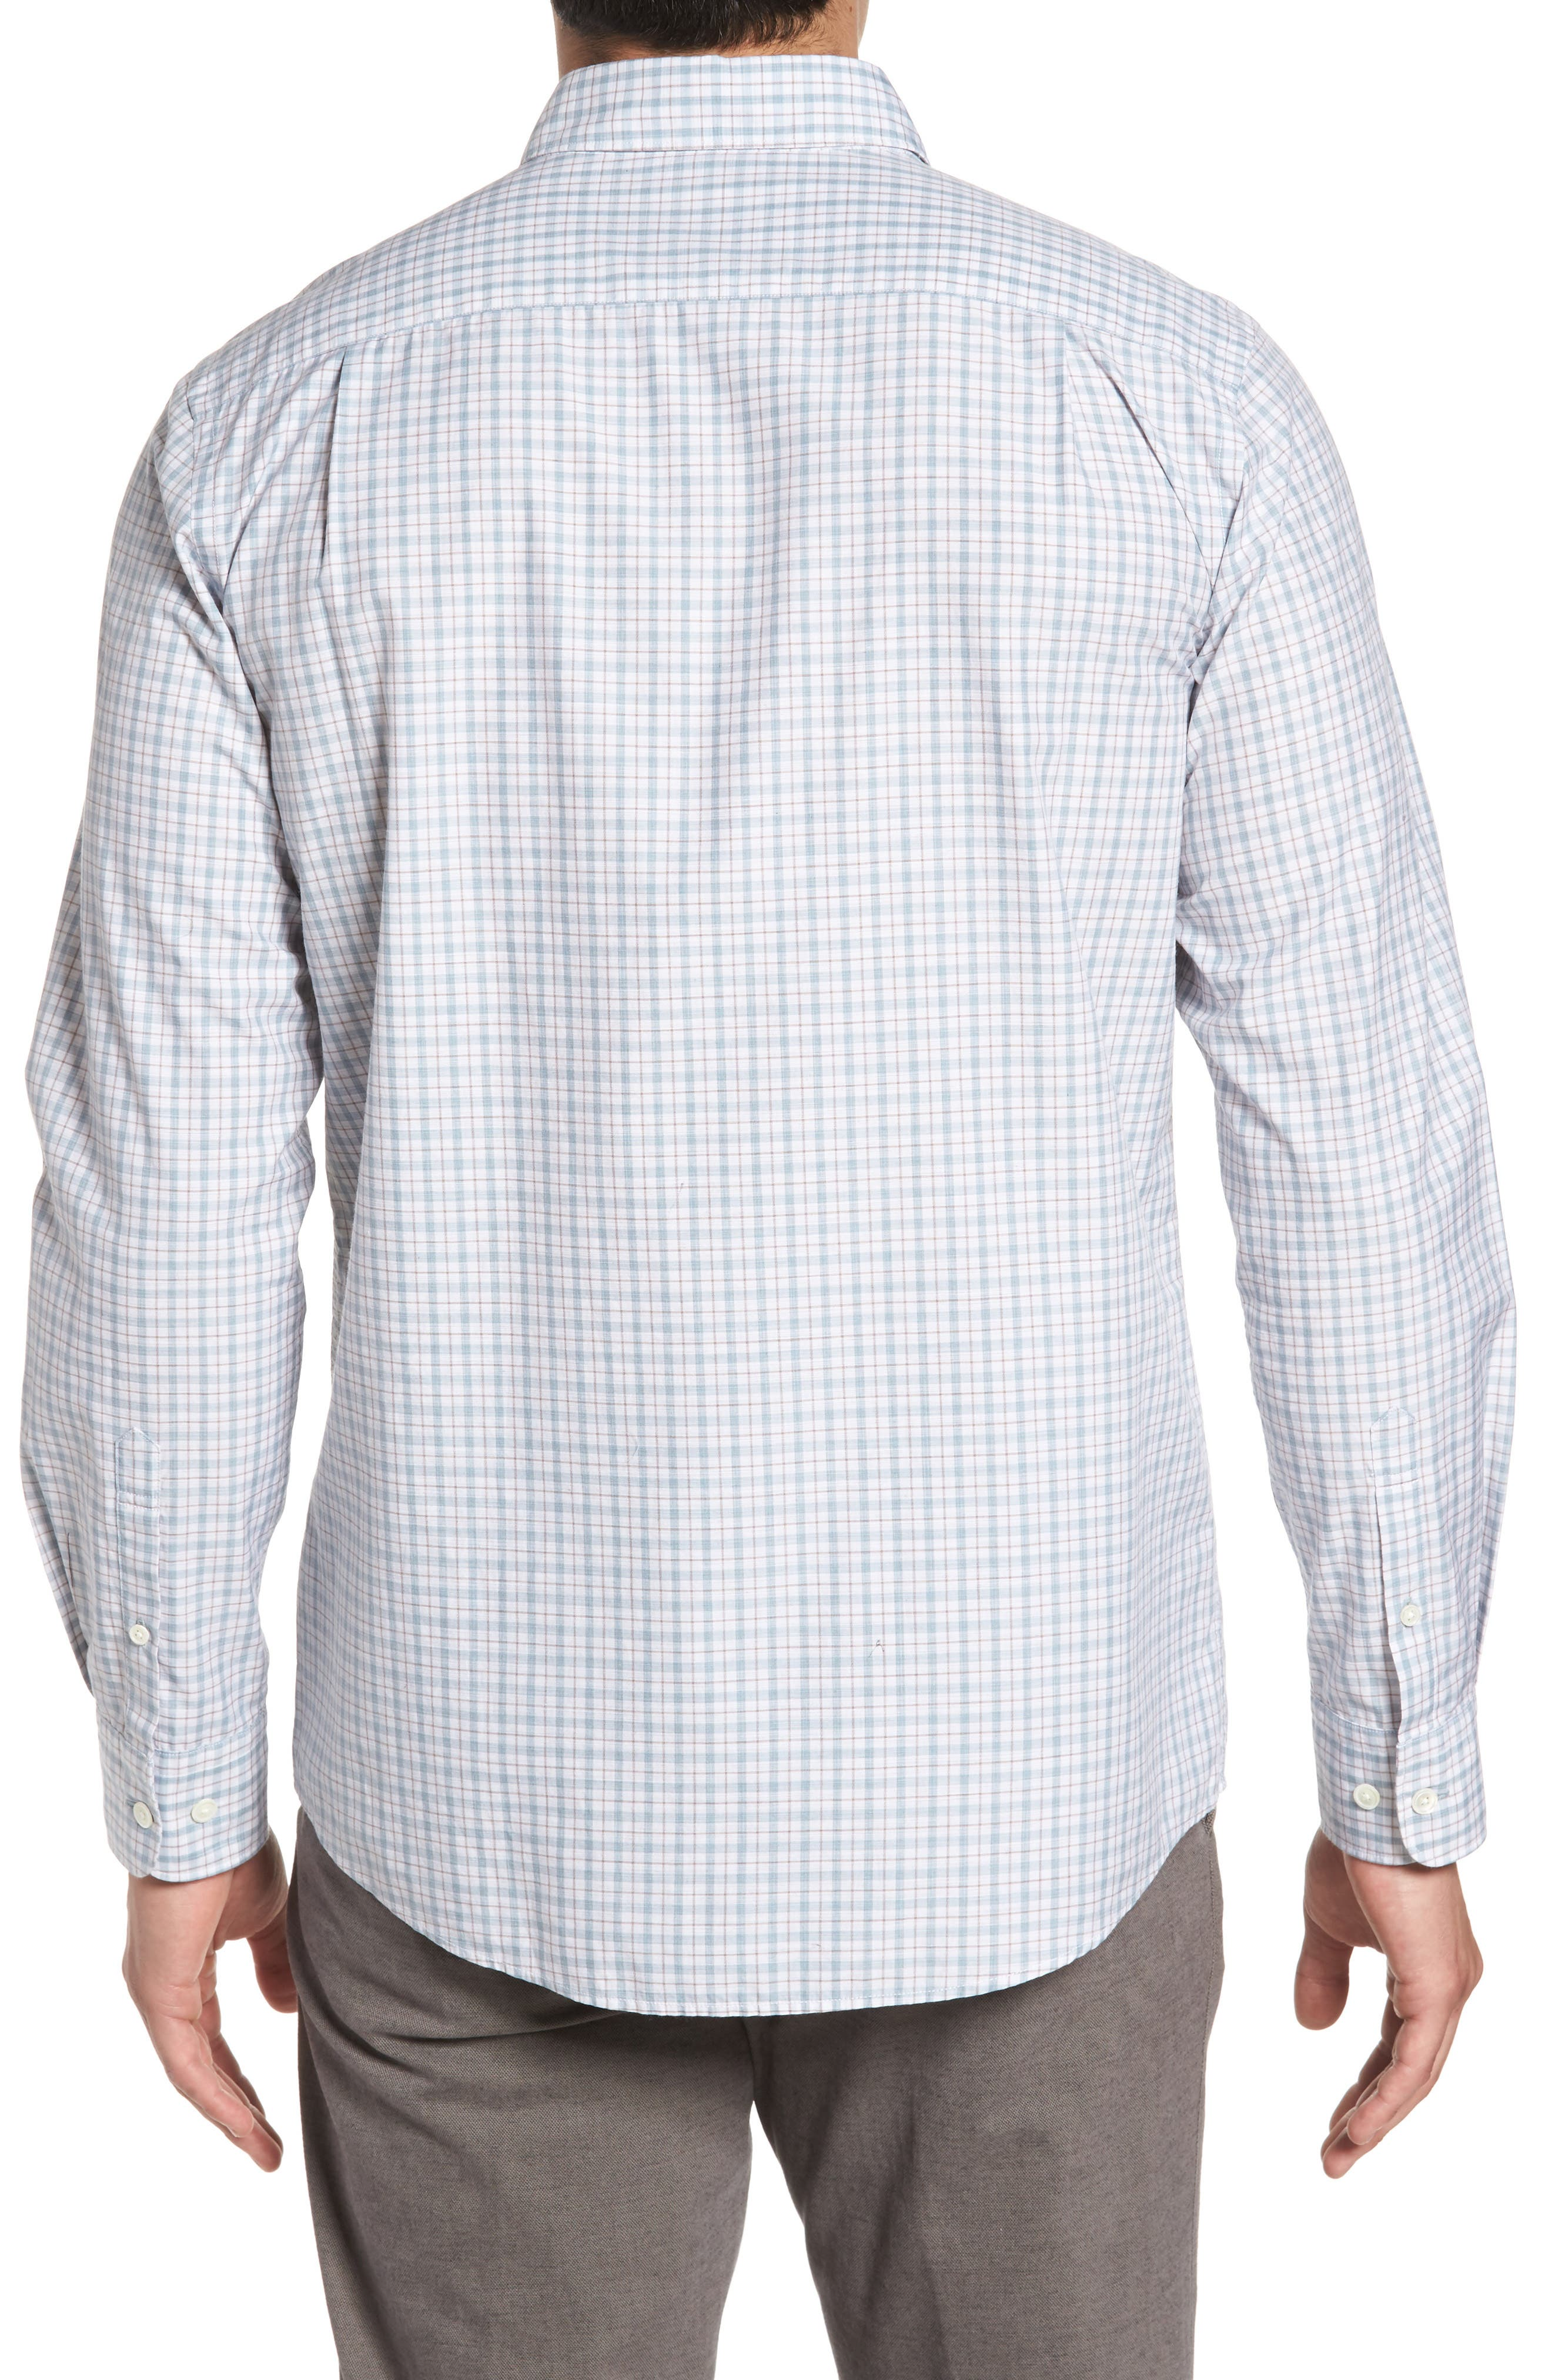 Carterton Sports Fit Plaid Sport Shirt,                             Alternate thumbnail 2, color,                             457